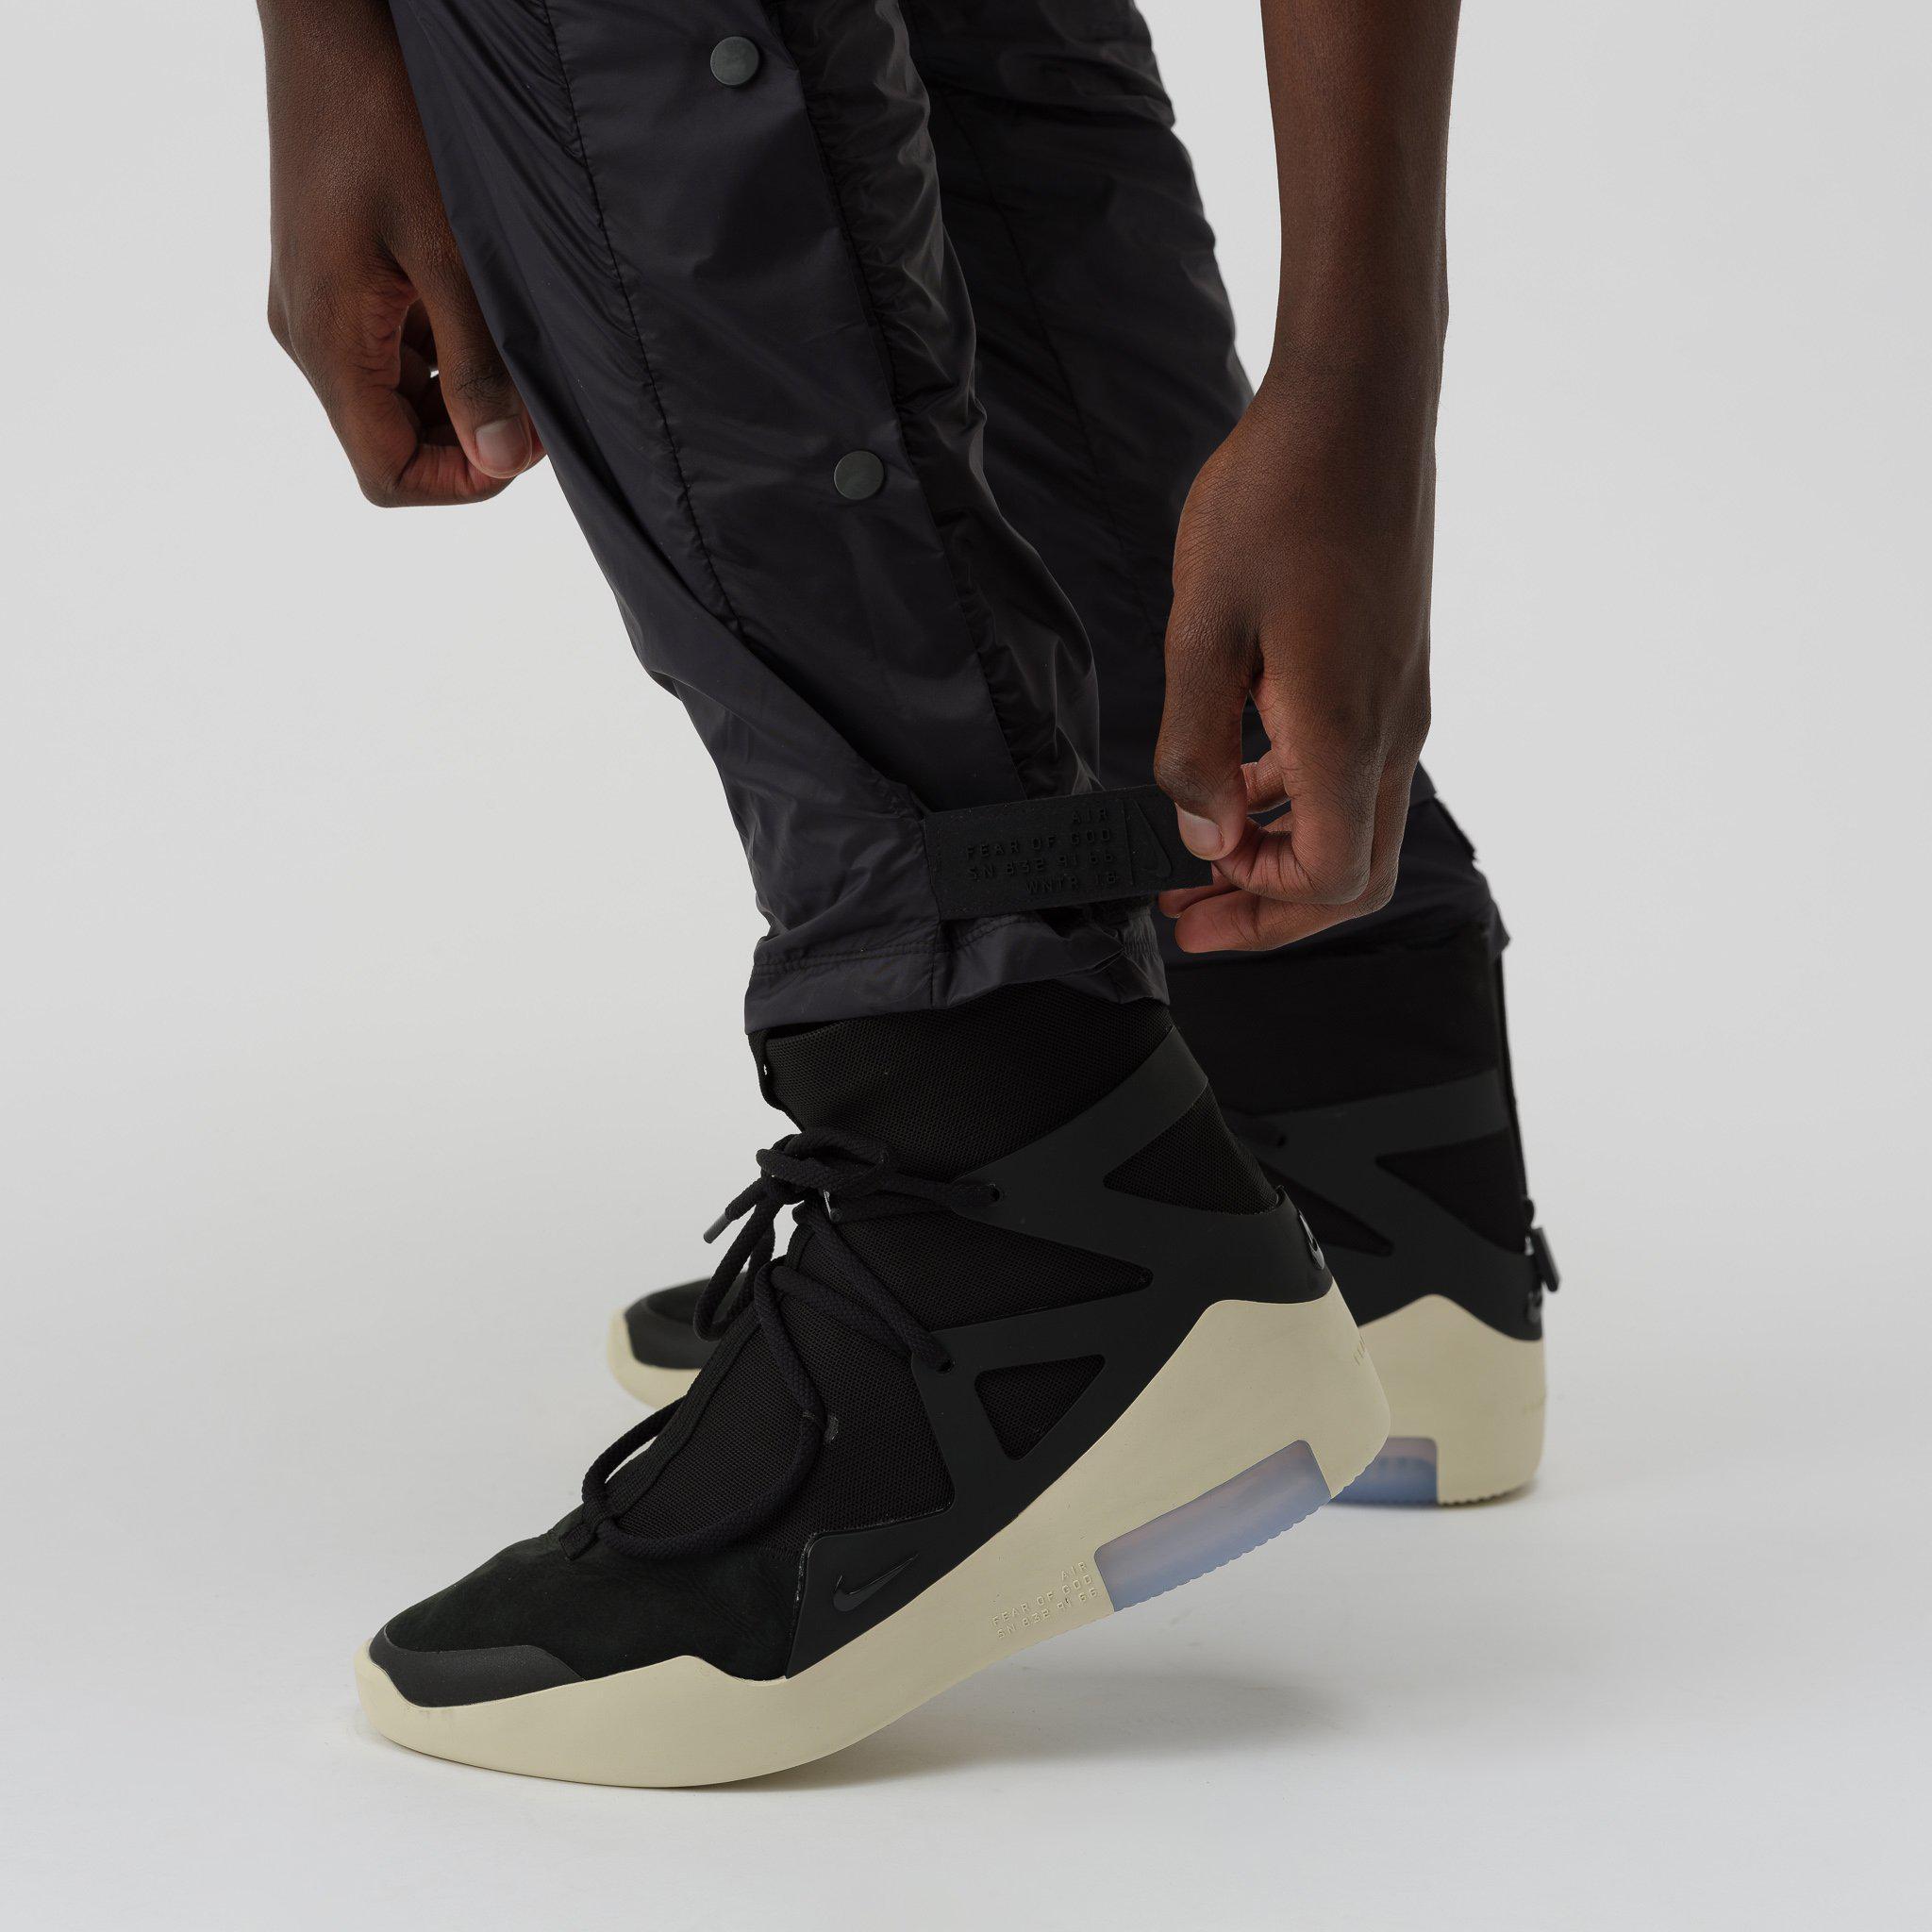 Nike Synthetic X Fear Of God Pants In Black For Men Lyst